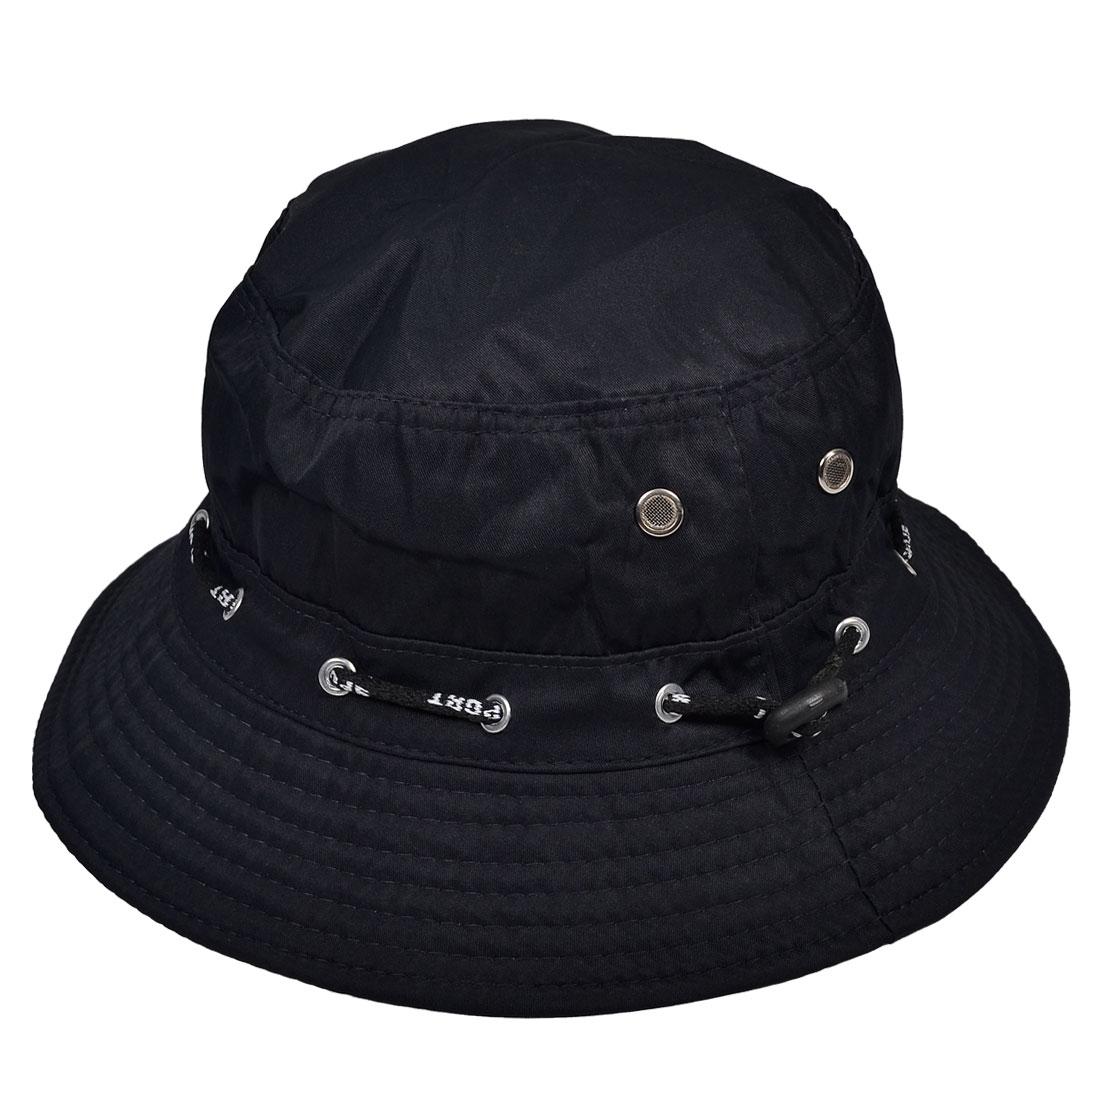 Dark Blue Stitching Brimmed Fabric Summer Beach Bucket Hat Cap for Woman Lady